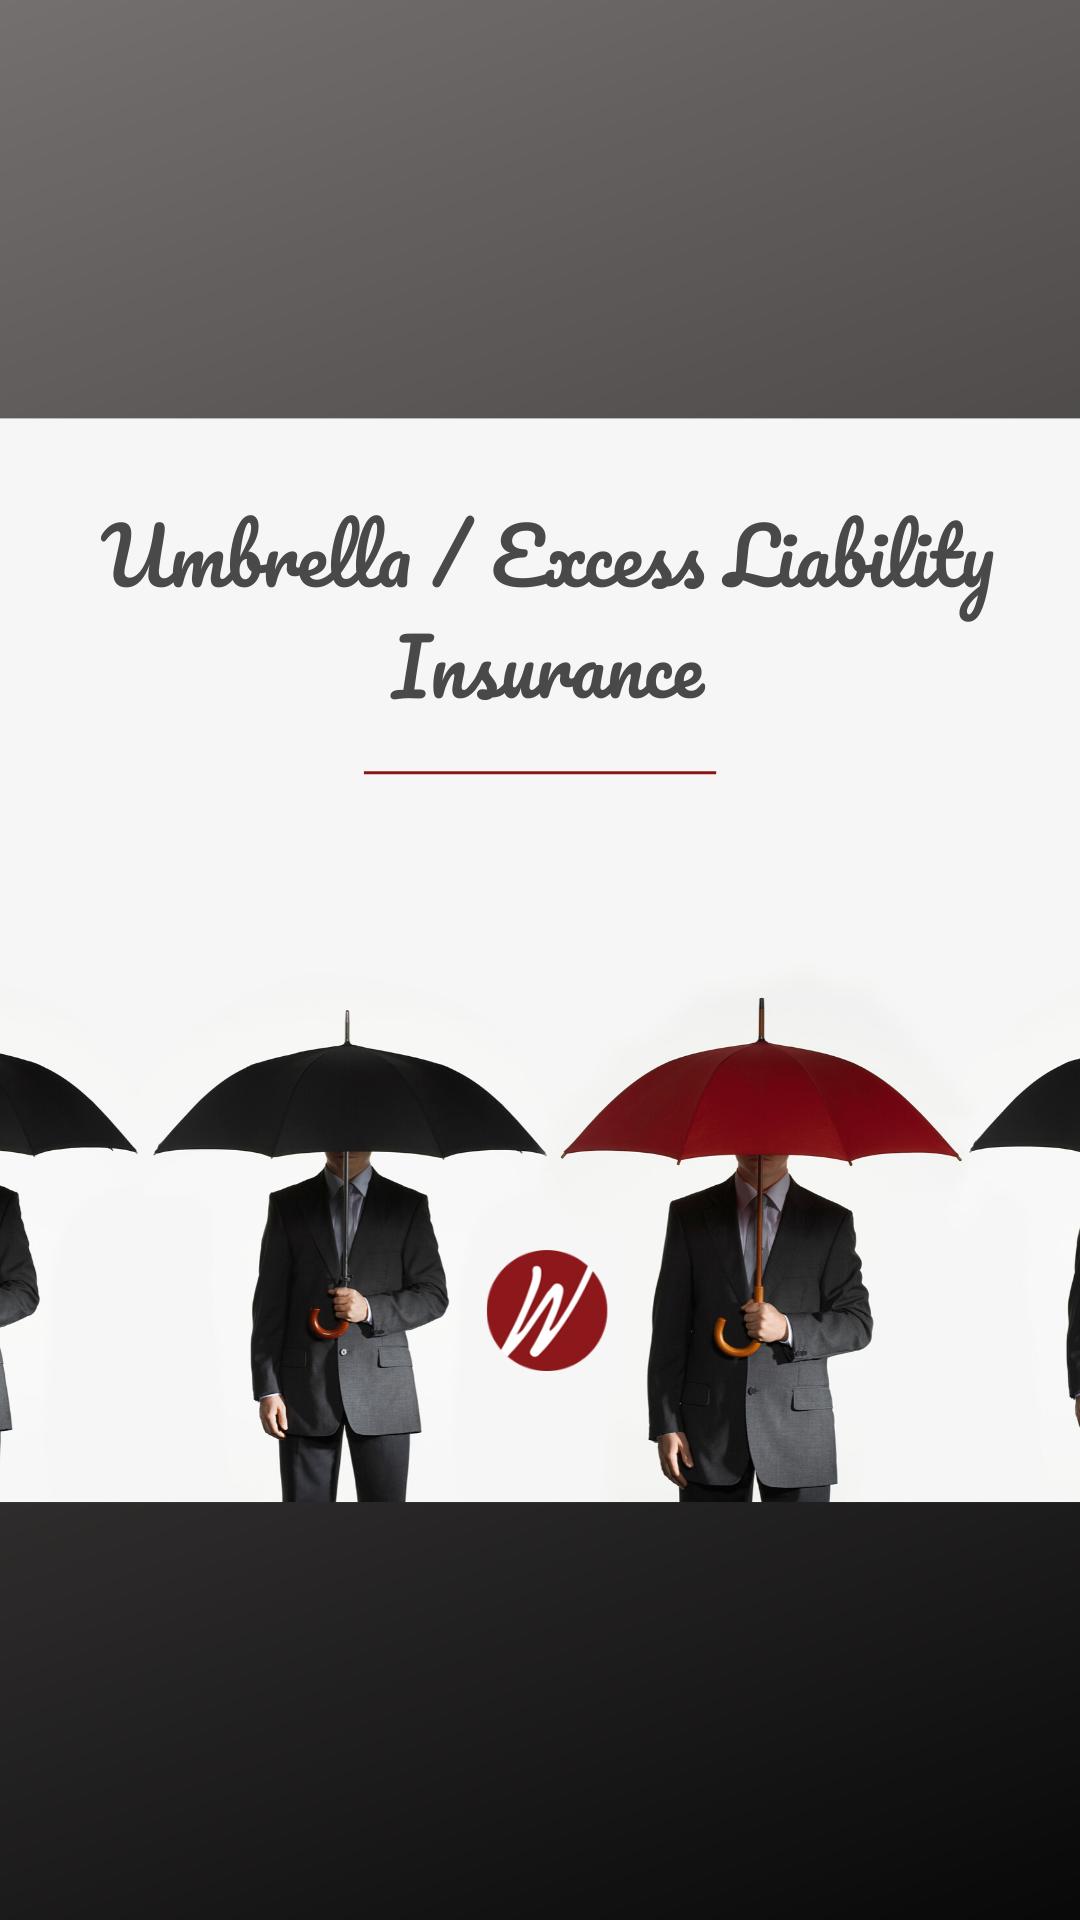 Umbrella Insurance in 2020 Umbrella insurance, Group